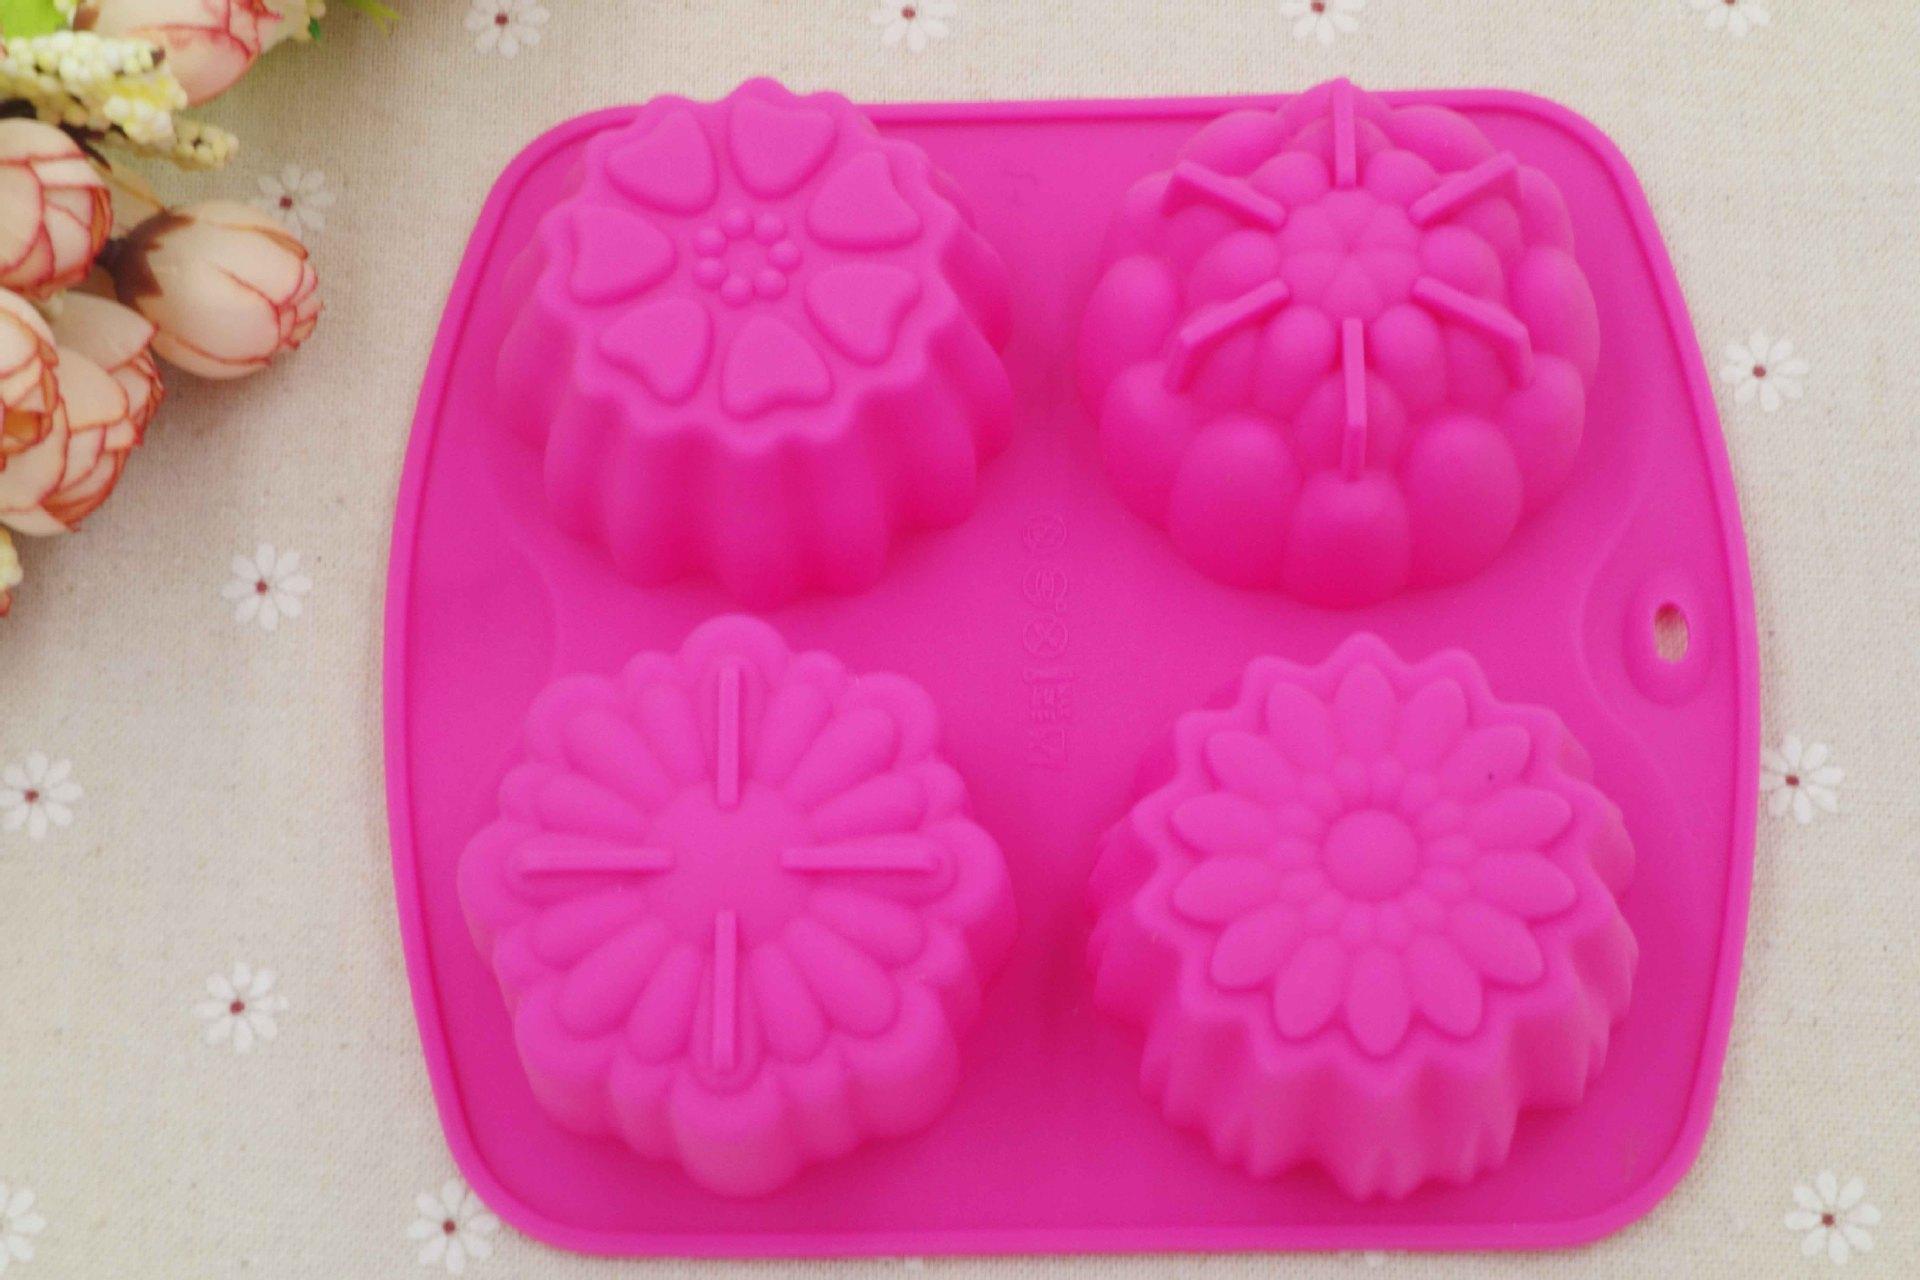 4 Even Pudding Jello Mold Handmade Soap Molds Flower